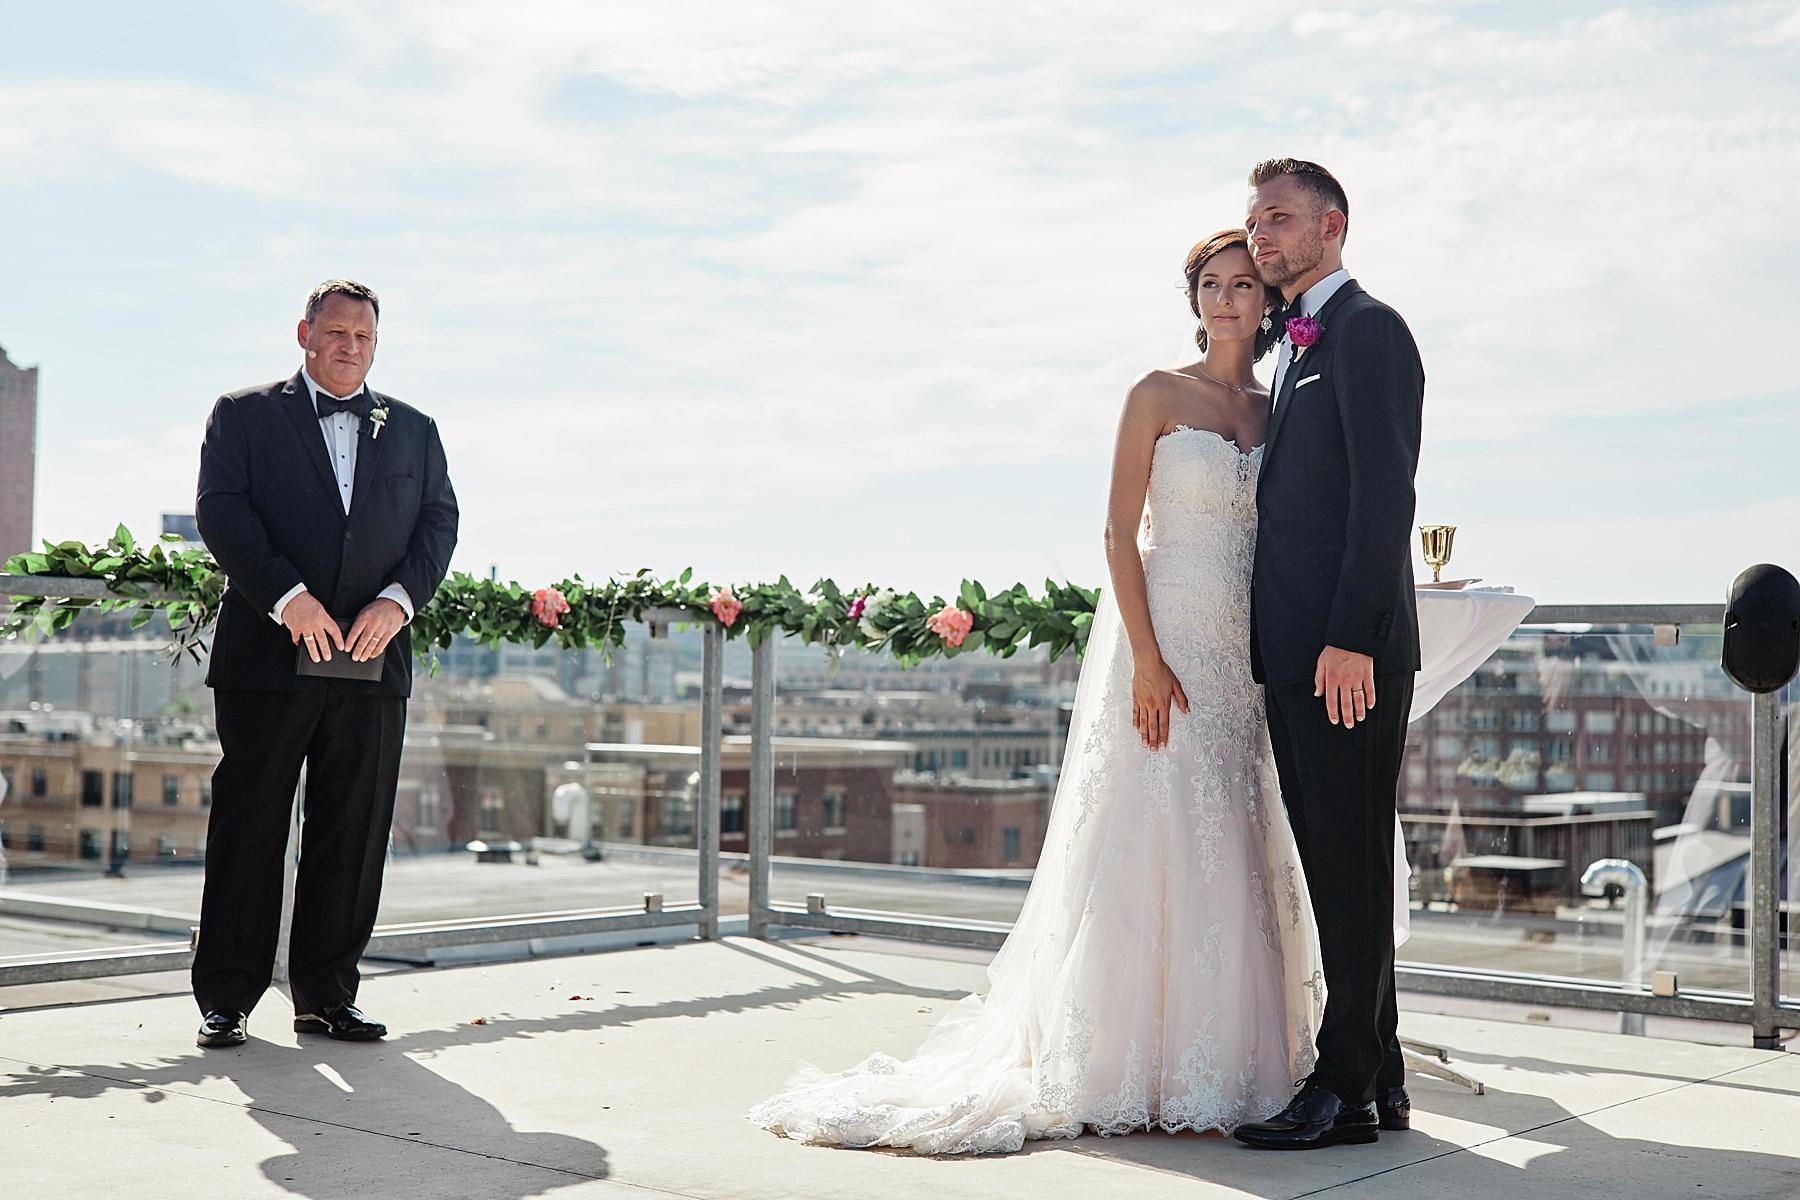 ABULAE-Wedding-Saint-paul-MN-Josh-Sofia-Wedding-Mears-Park_0771.jpg